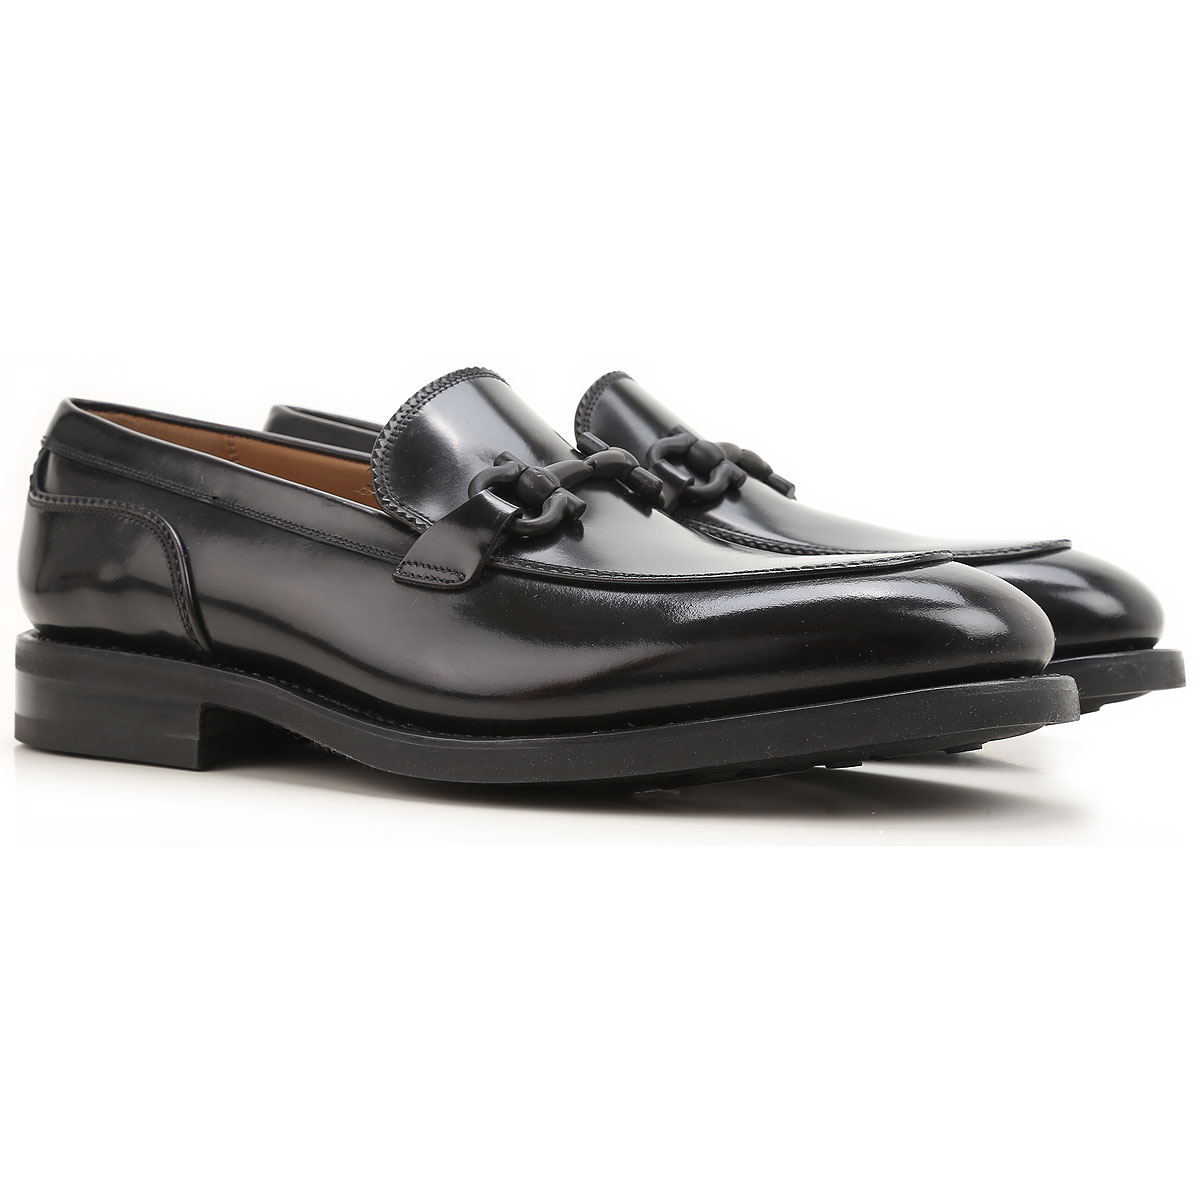 Image of Salvatore Ferragamo Loafers for Men On Sale, Black, Leather, 2017, 10.5 7